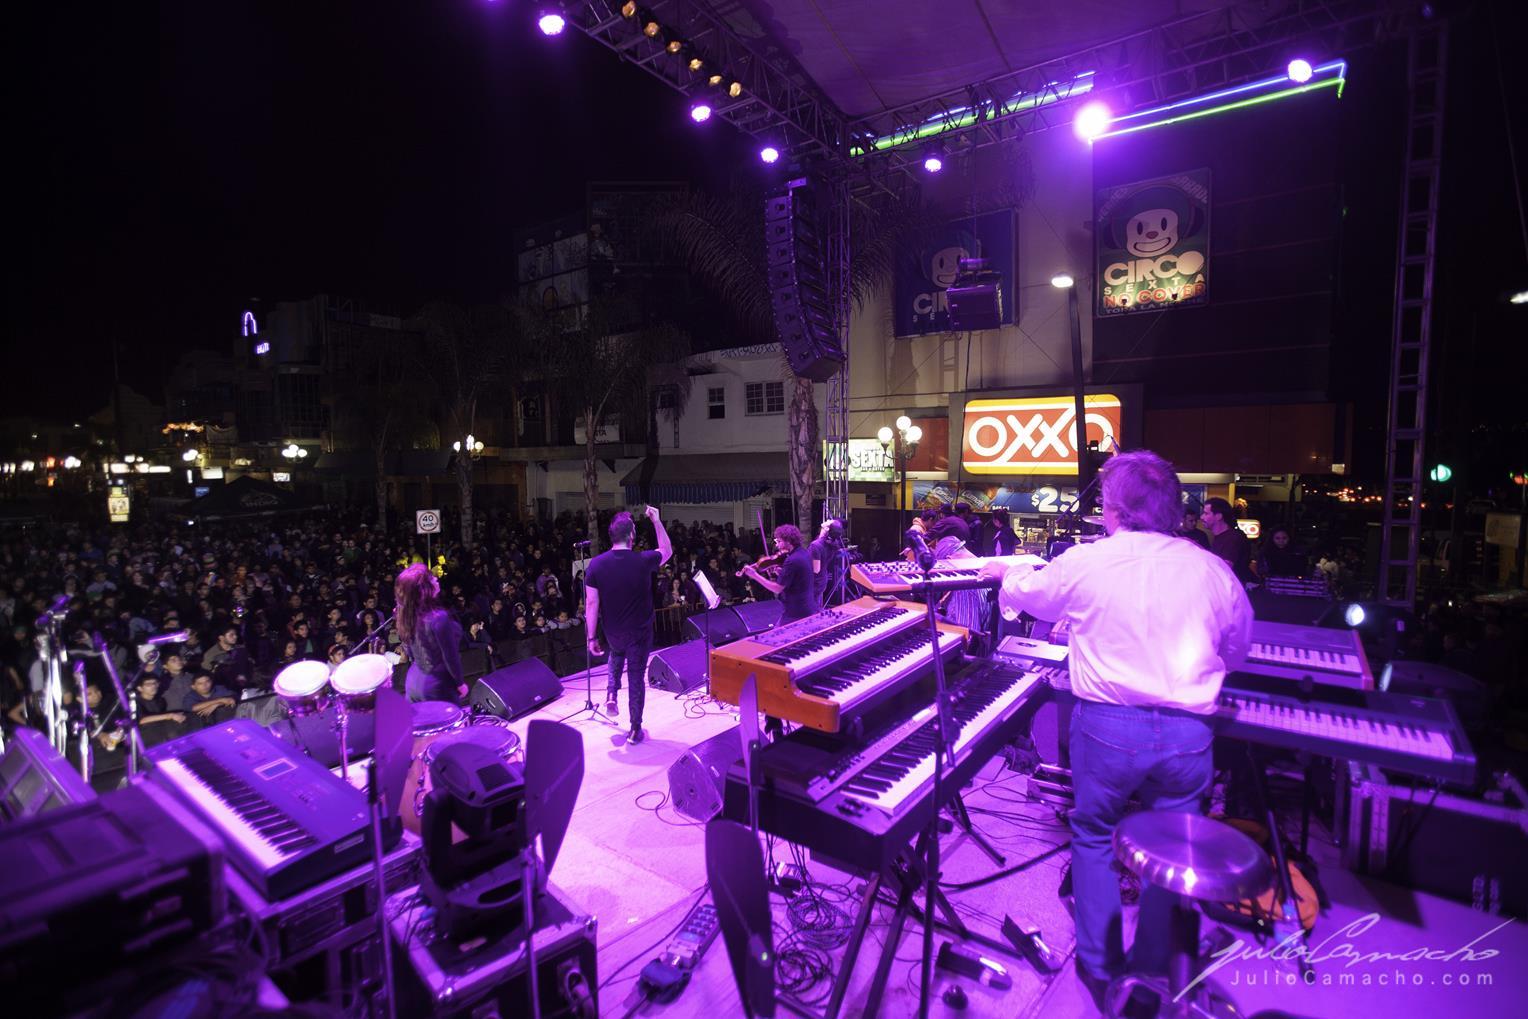 2014-10-30 31 CAST TOUR Ensenada y Tijuana - 1710 - www.Juli (Copy).jpg